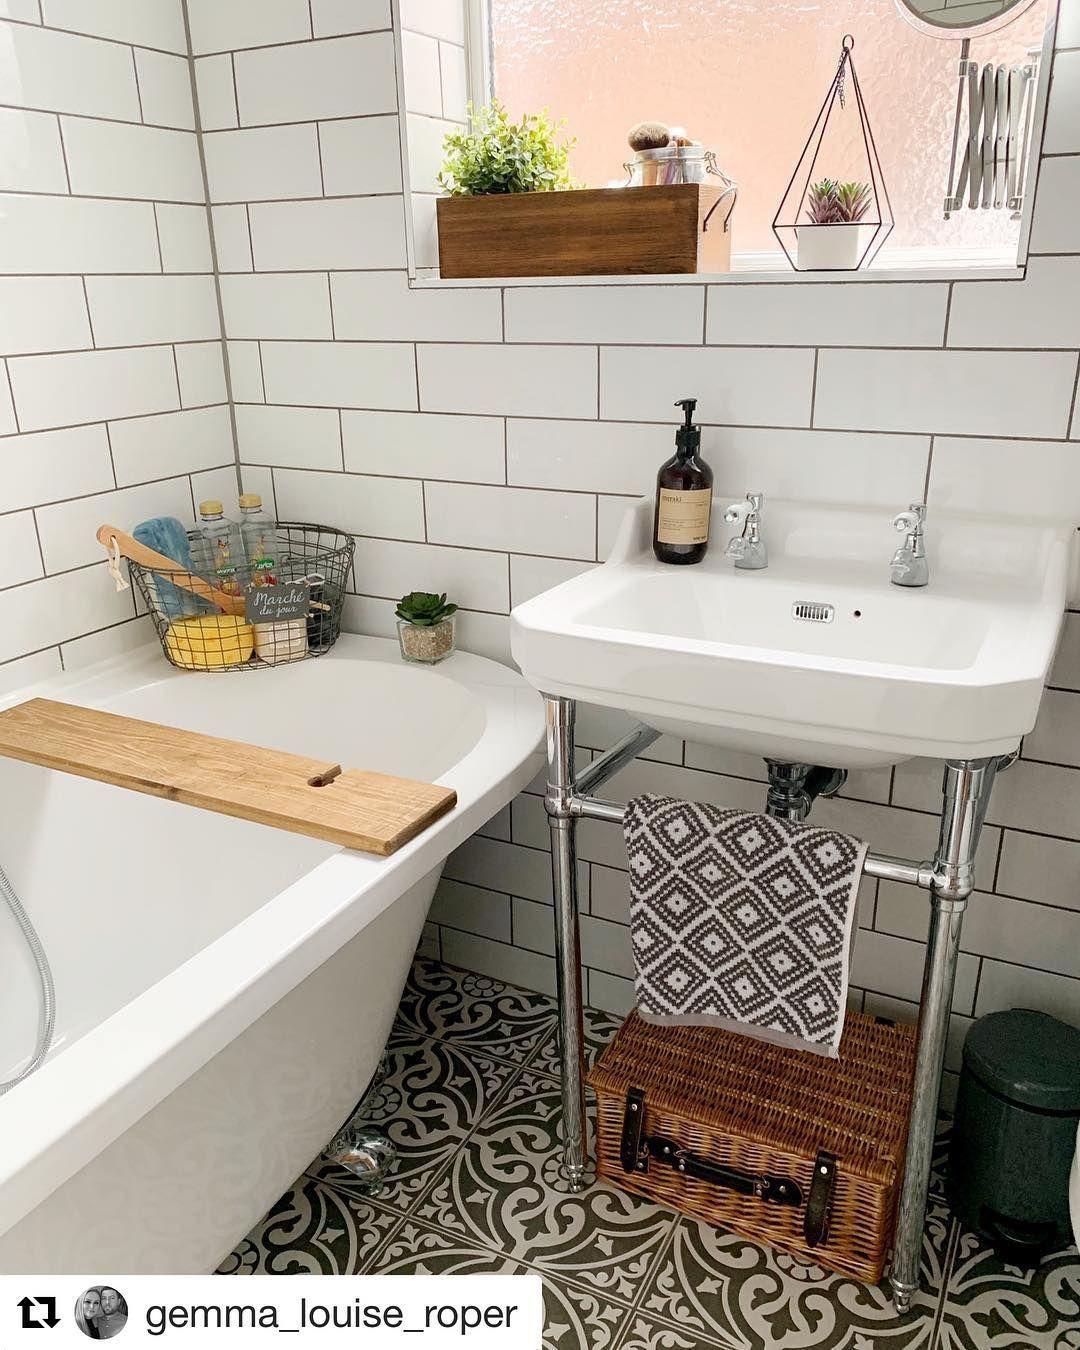 Small Bathroom Ideas 2020 Scandinavian In 2020 Small Bathroom Trends Bathroom Trends Large Bathroom Design